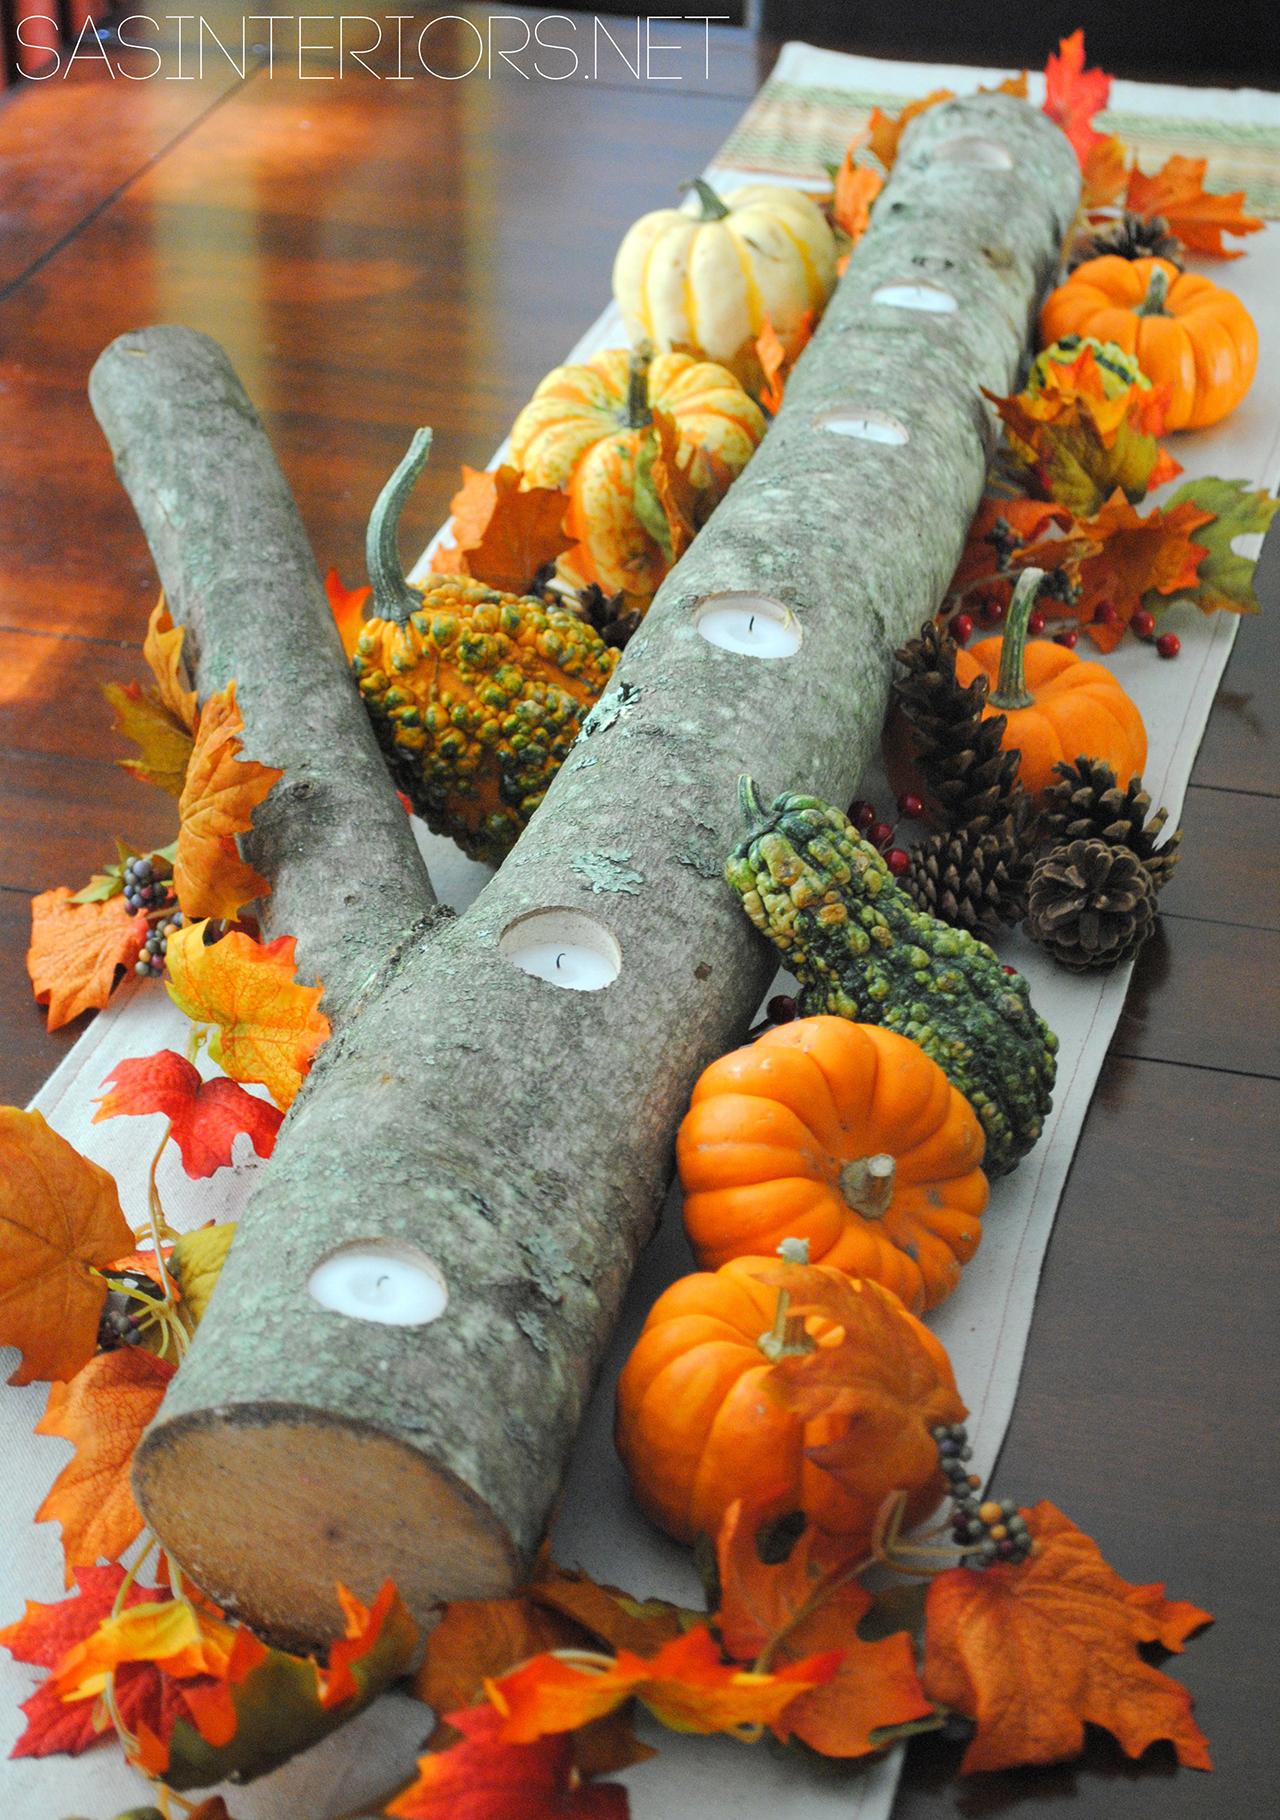 DIY Festive Fall Centerpieces| Fall Centerpiece Projects, Fall Centerpieces, DIY Fall Centerpieces, Fall Home Decor, DIY Home Decor, DIY Fall Decor, Easy to Make Fall Centerpieces, Popular Pin